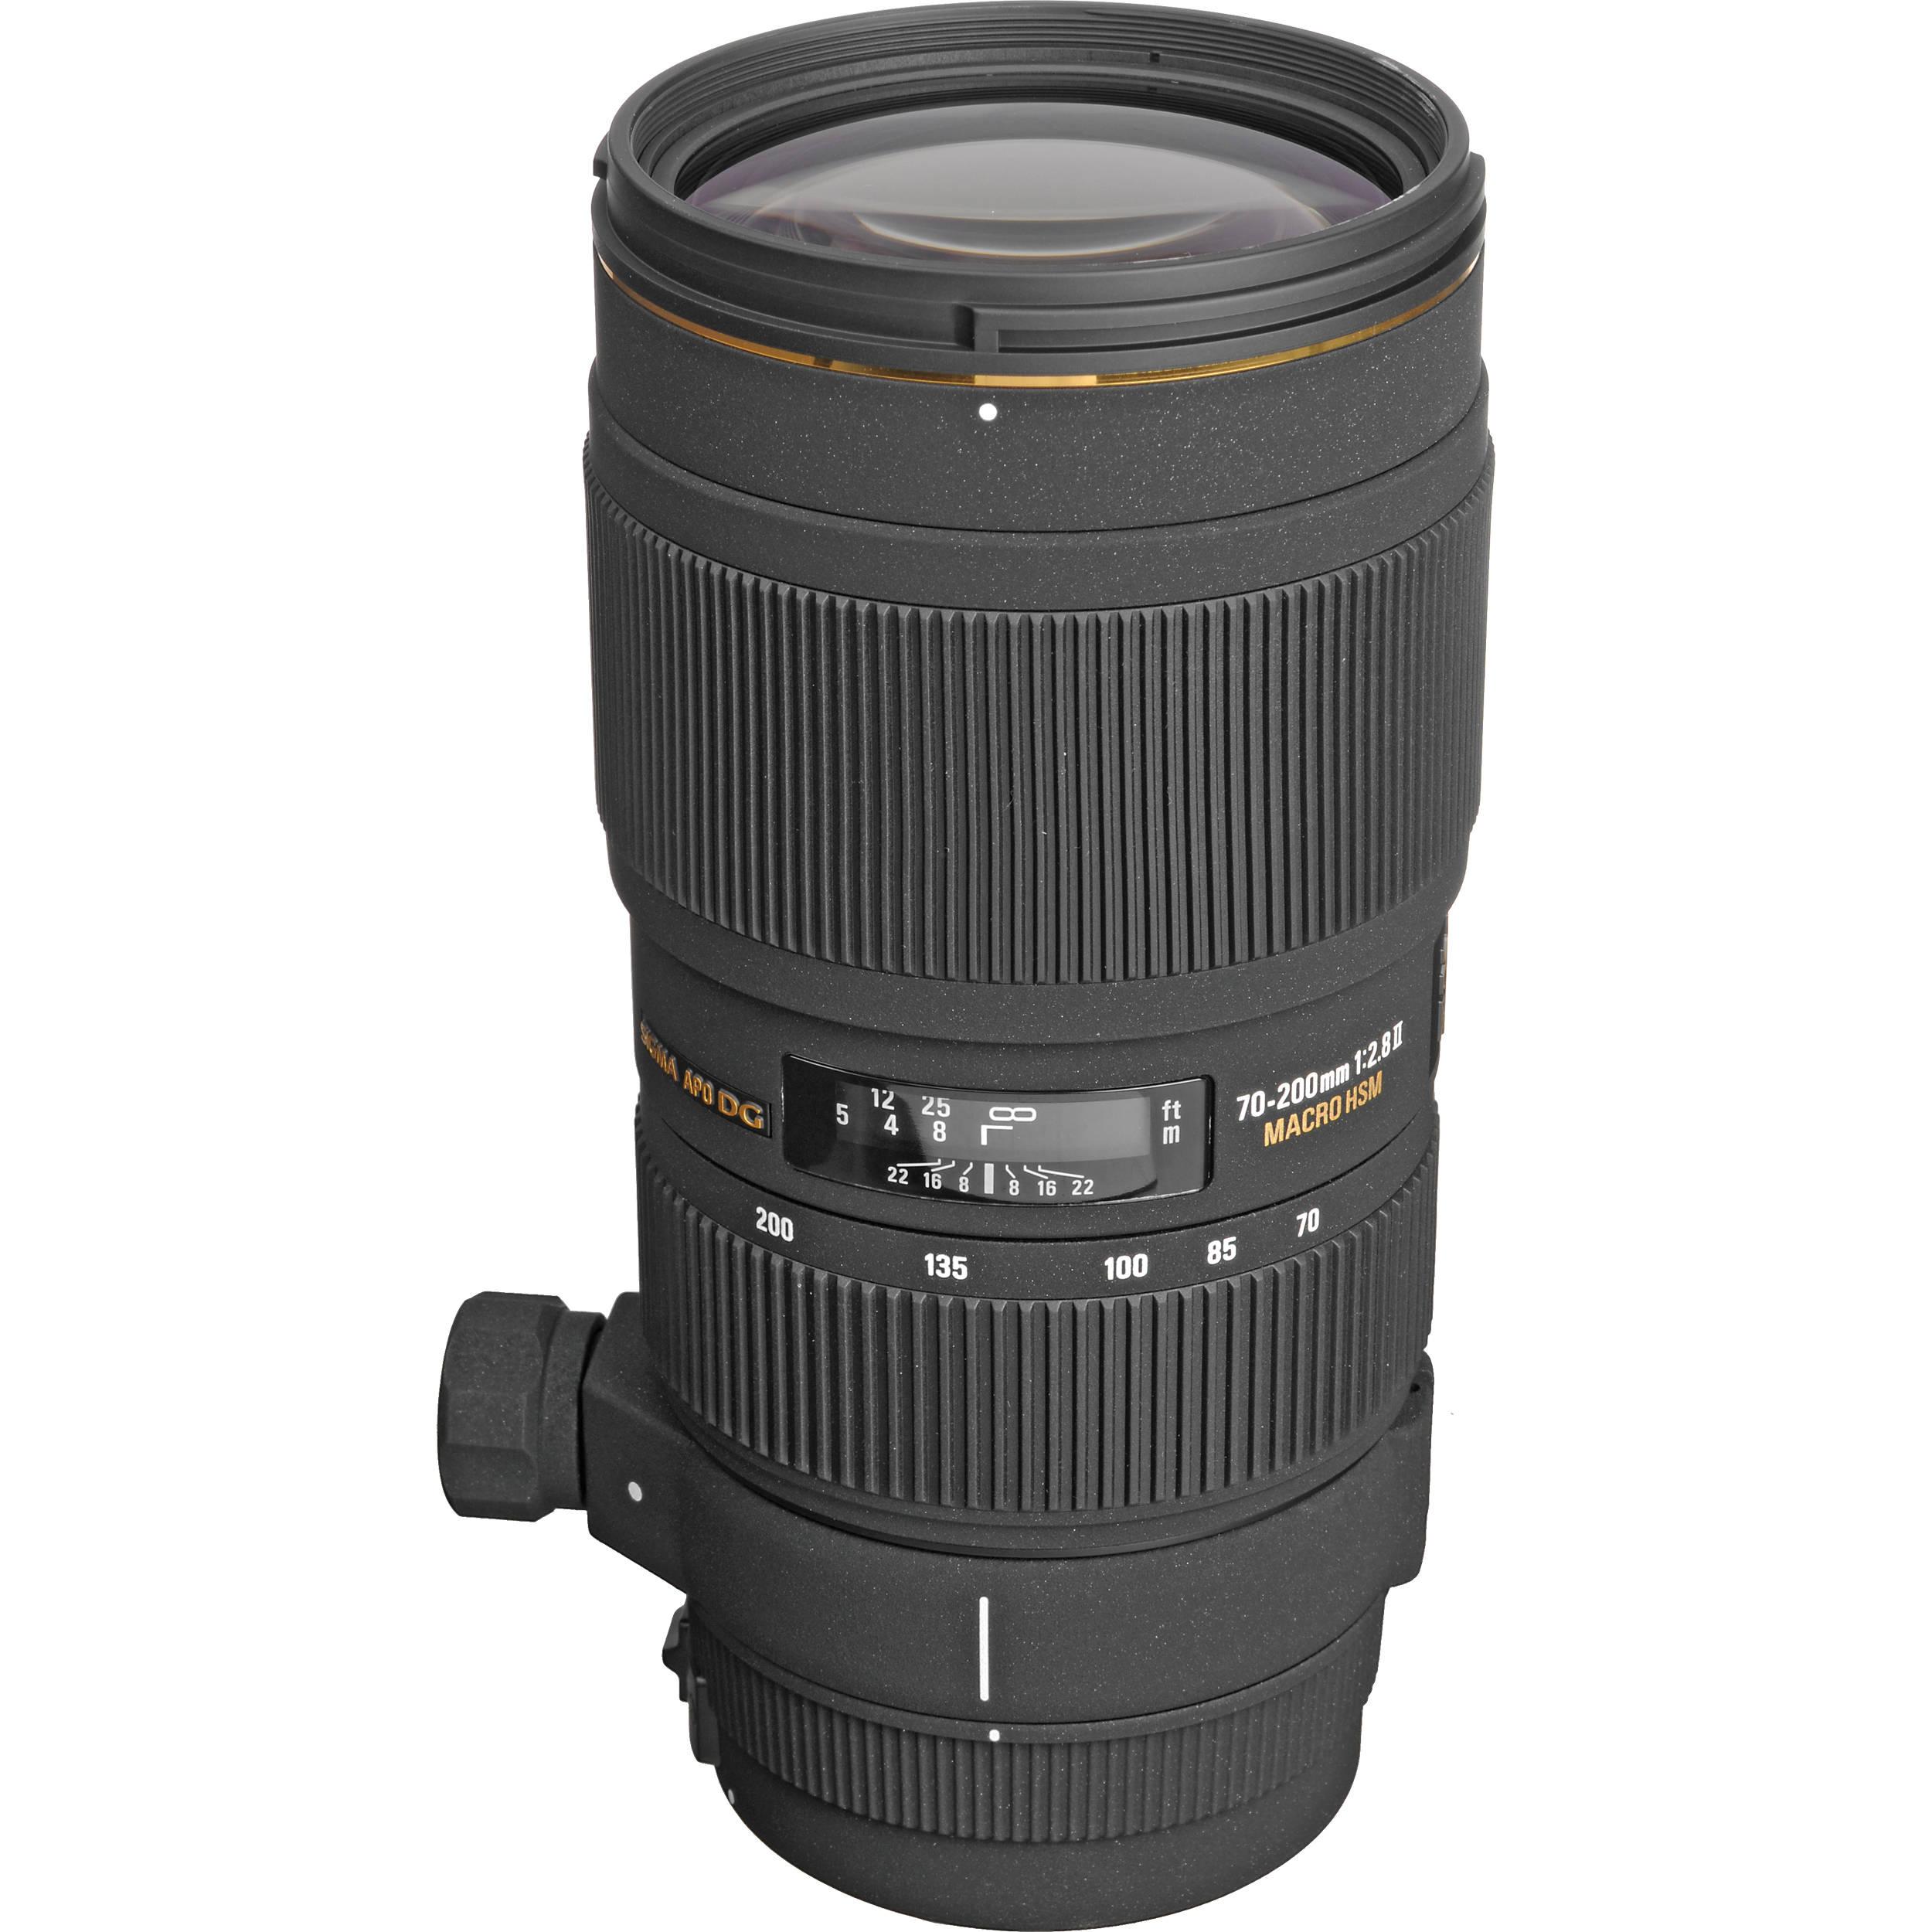 70-200mm Sigma T2.8